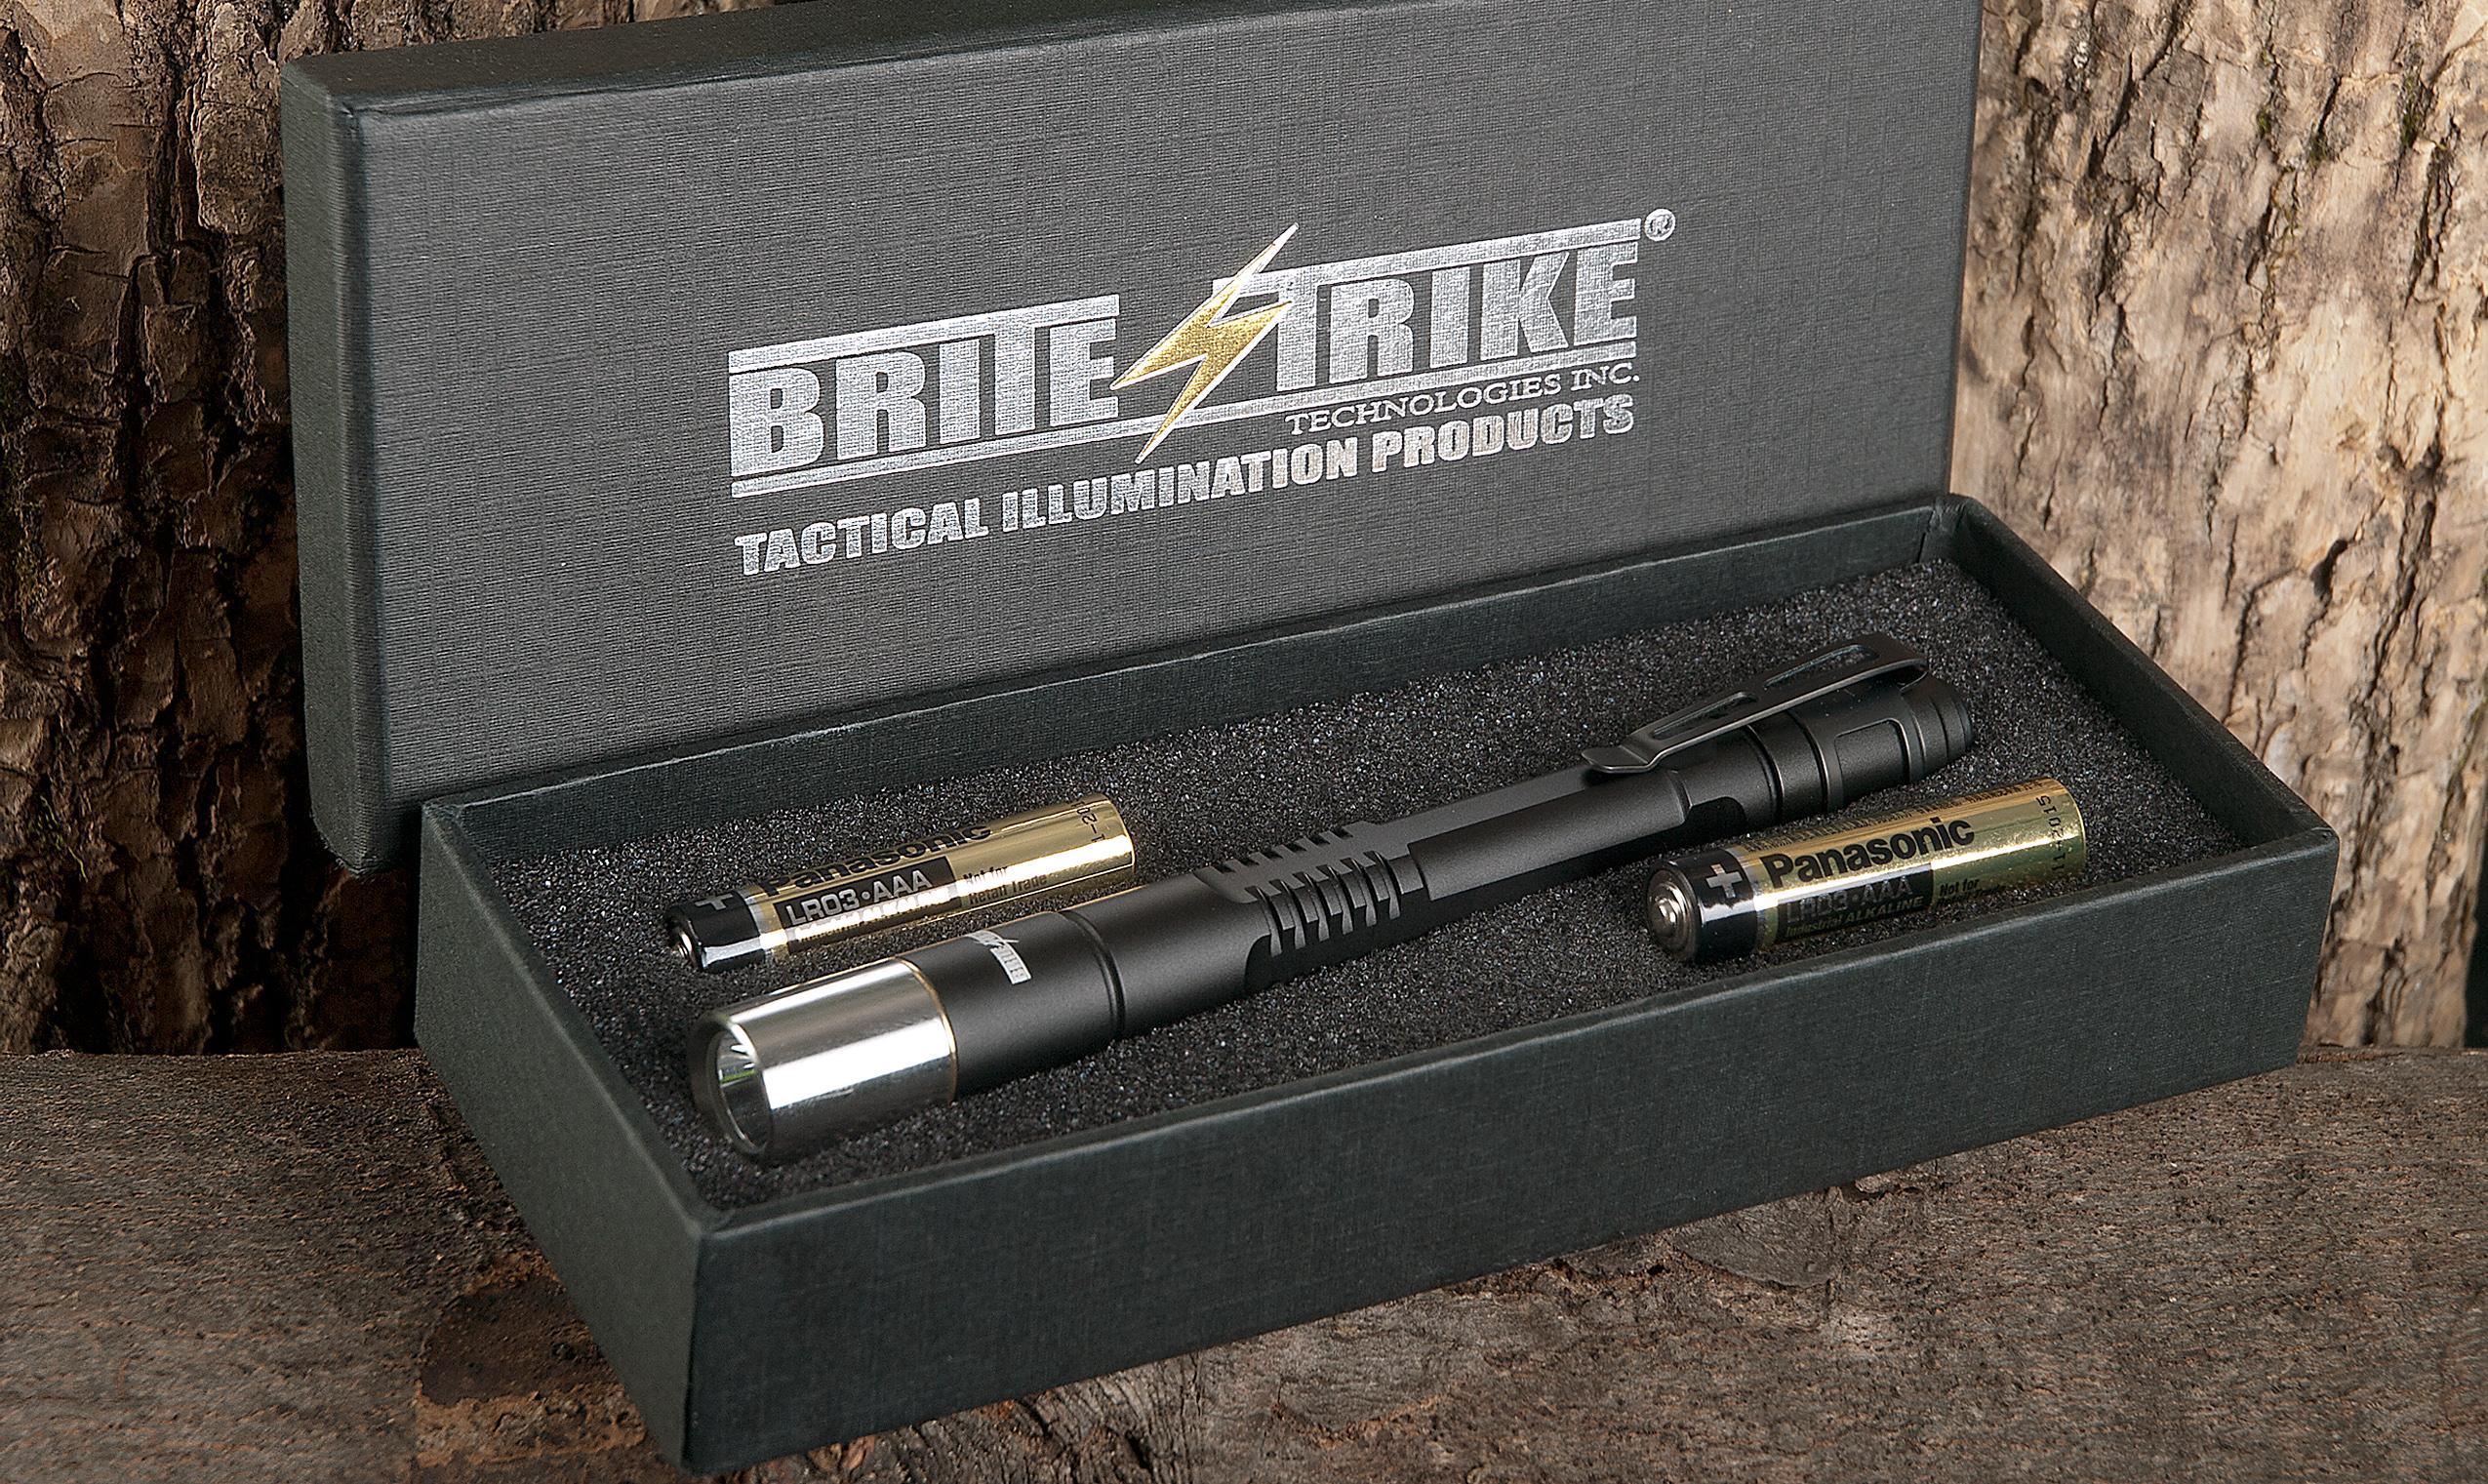 Amazon.com: Customer reviews: Brite Strike EPLI Executive ...